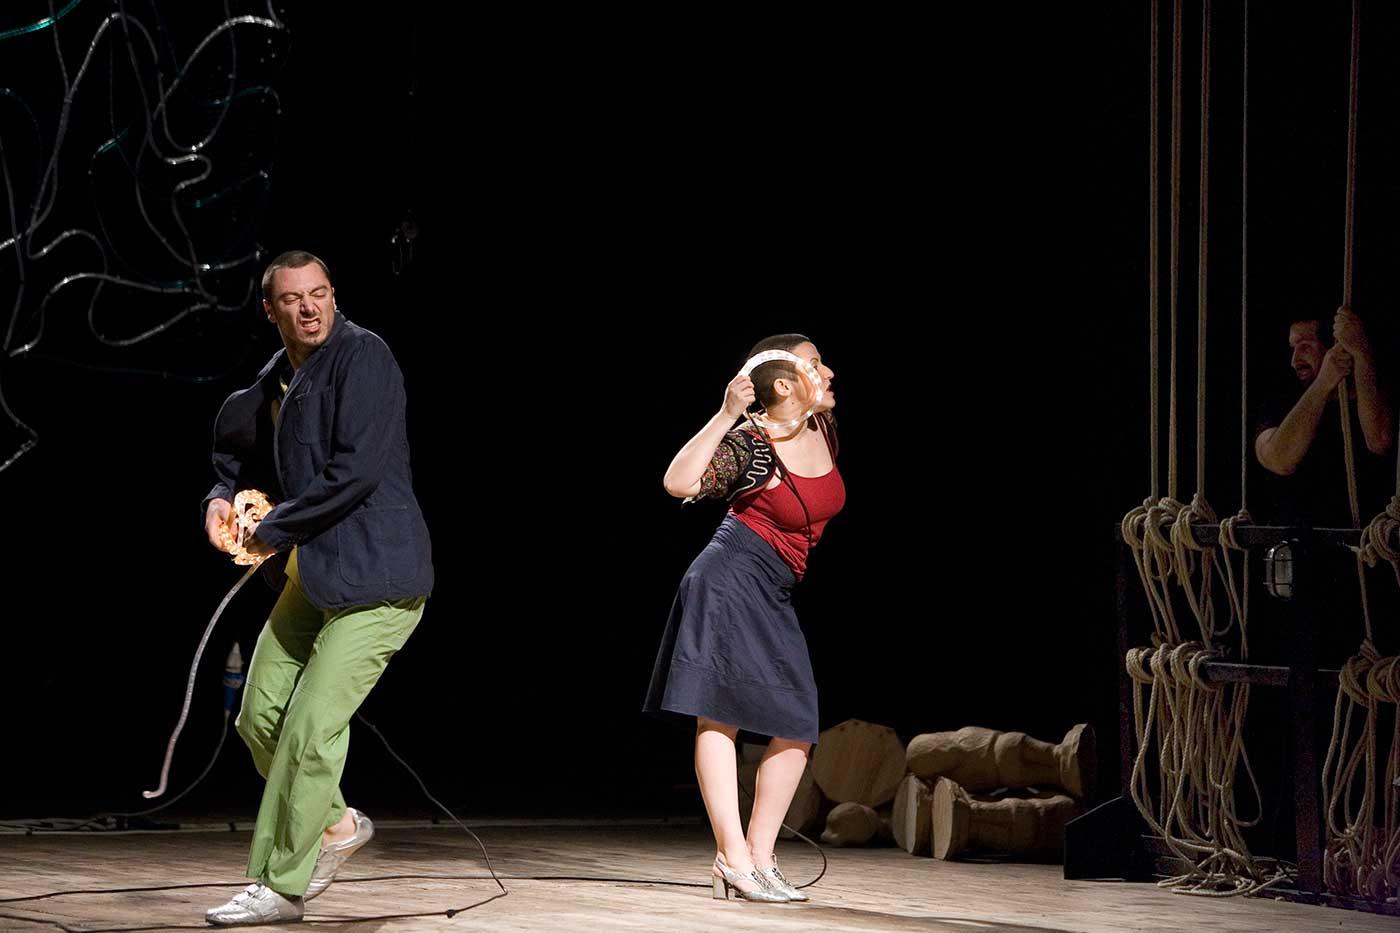 Babilonia Teatri. Made in Italy. 2007. © Foto di Nirmal Caselli.